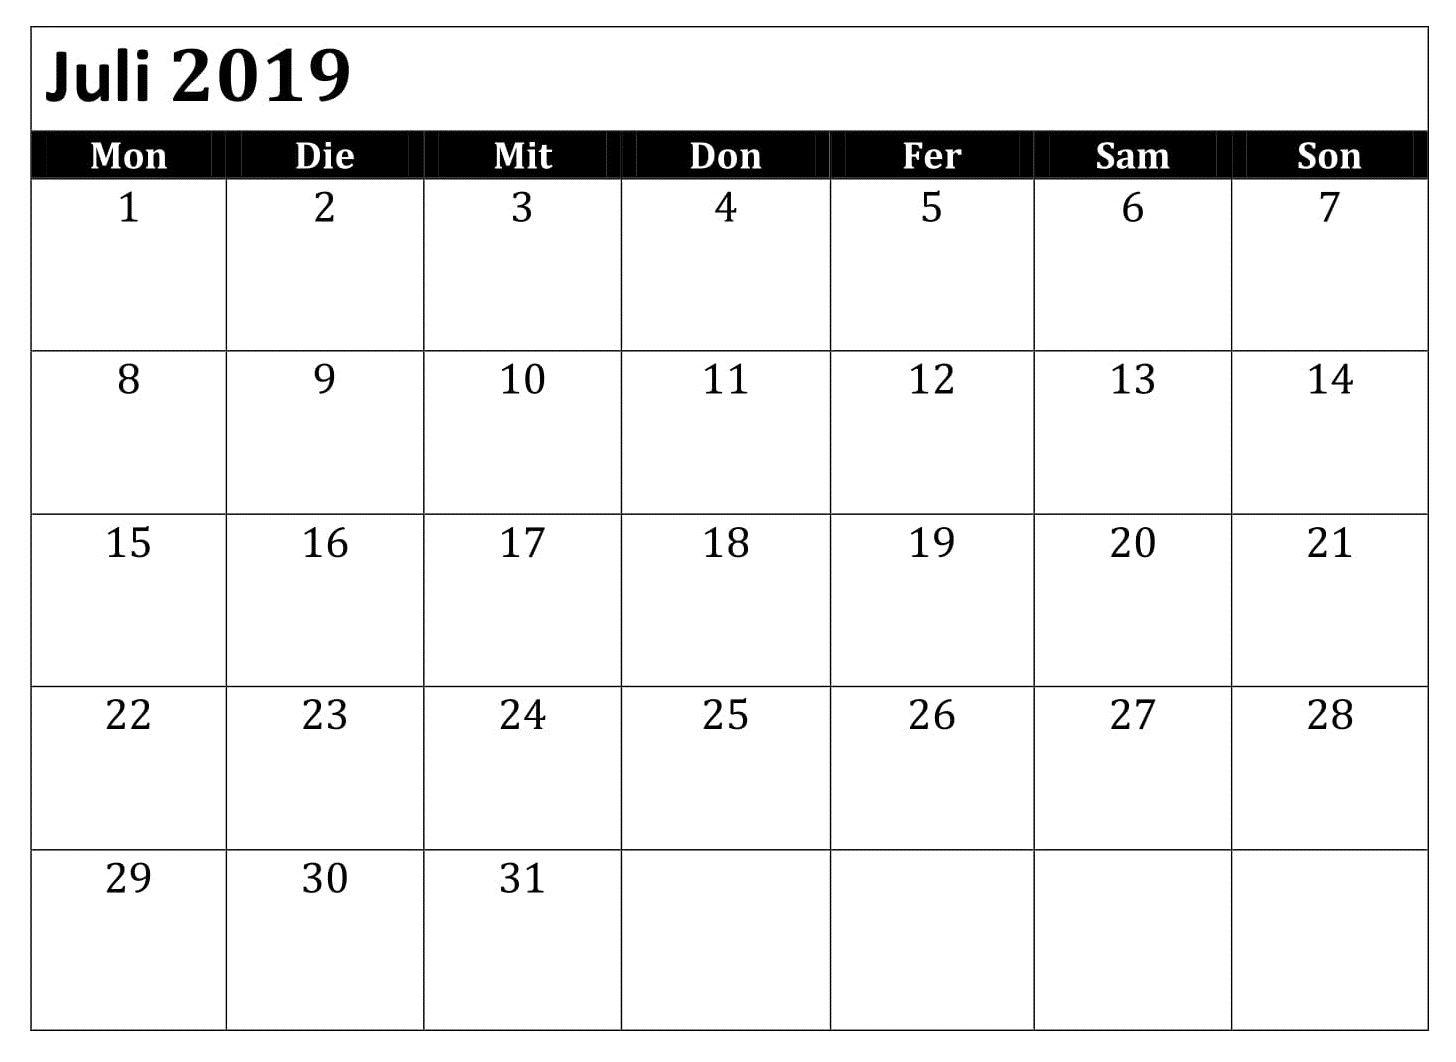 Juli Kalender 2019 Zum Ausdrucken Pdf Calendar Word 2019